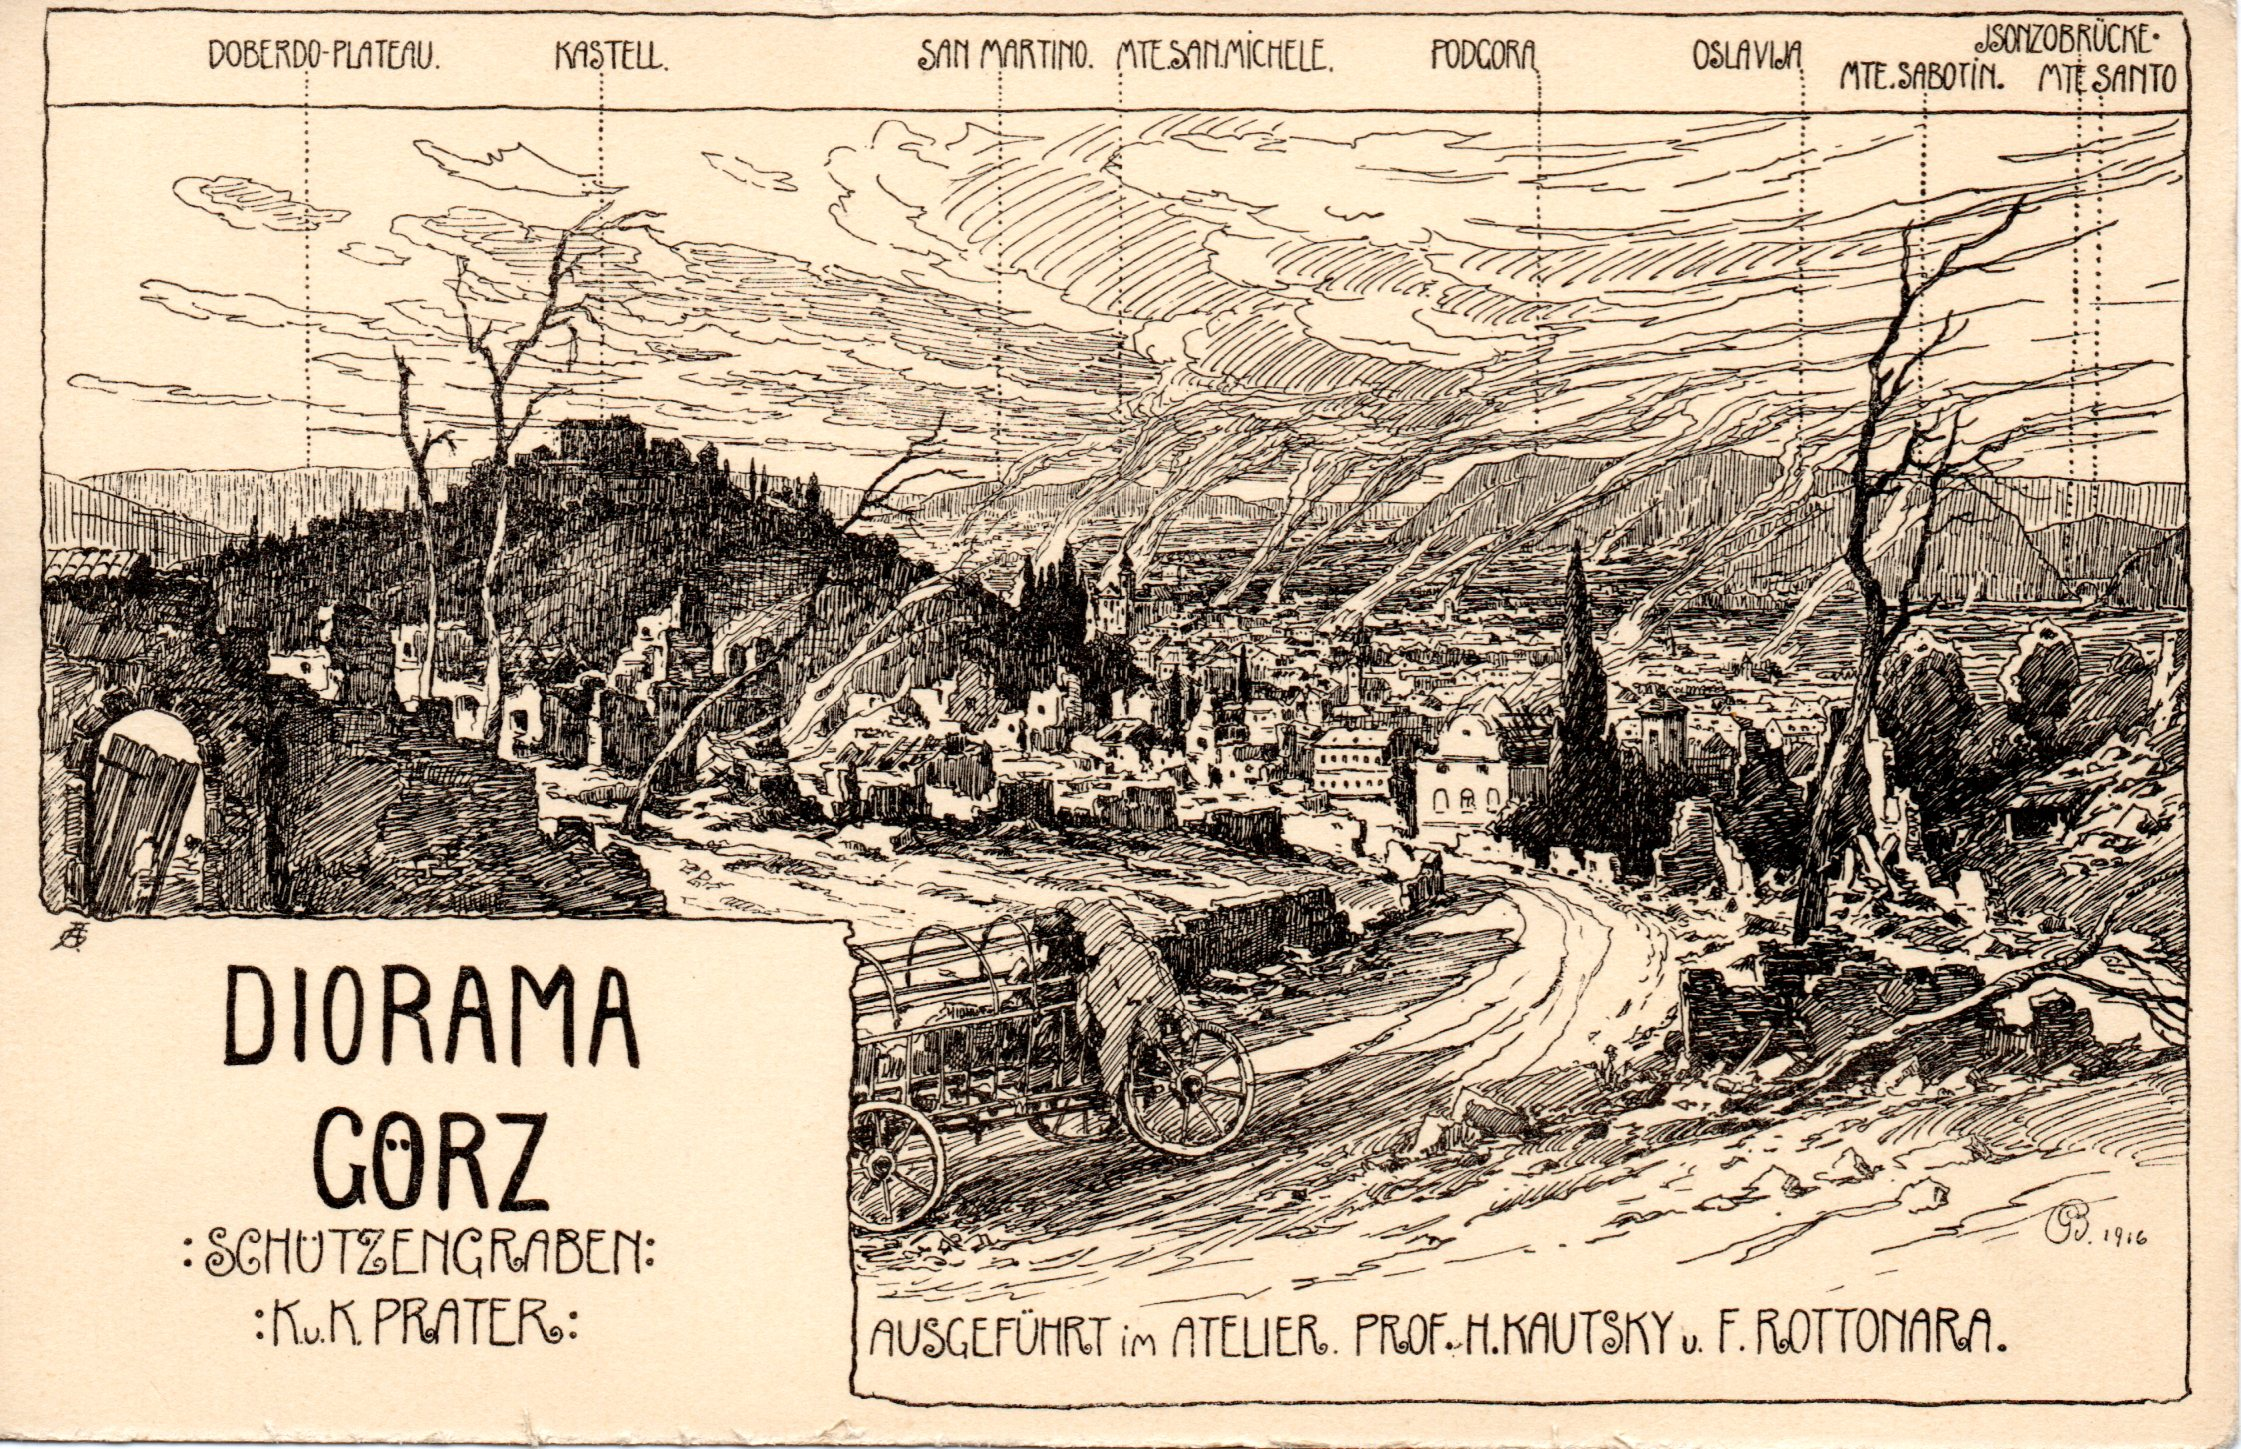 GORIZIA 1